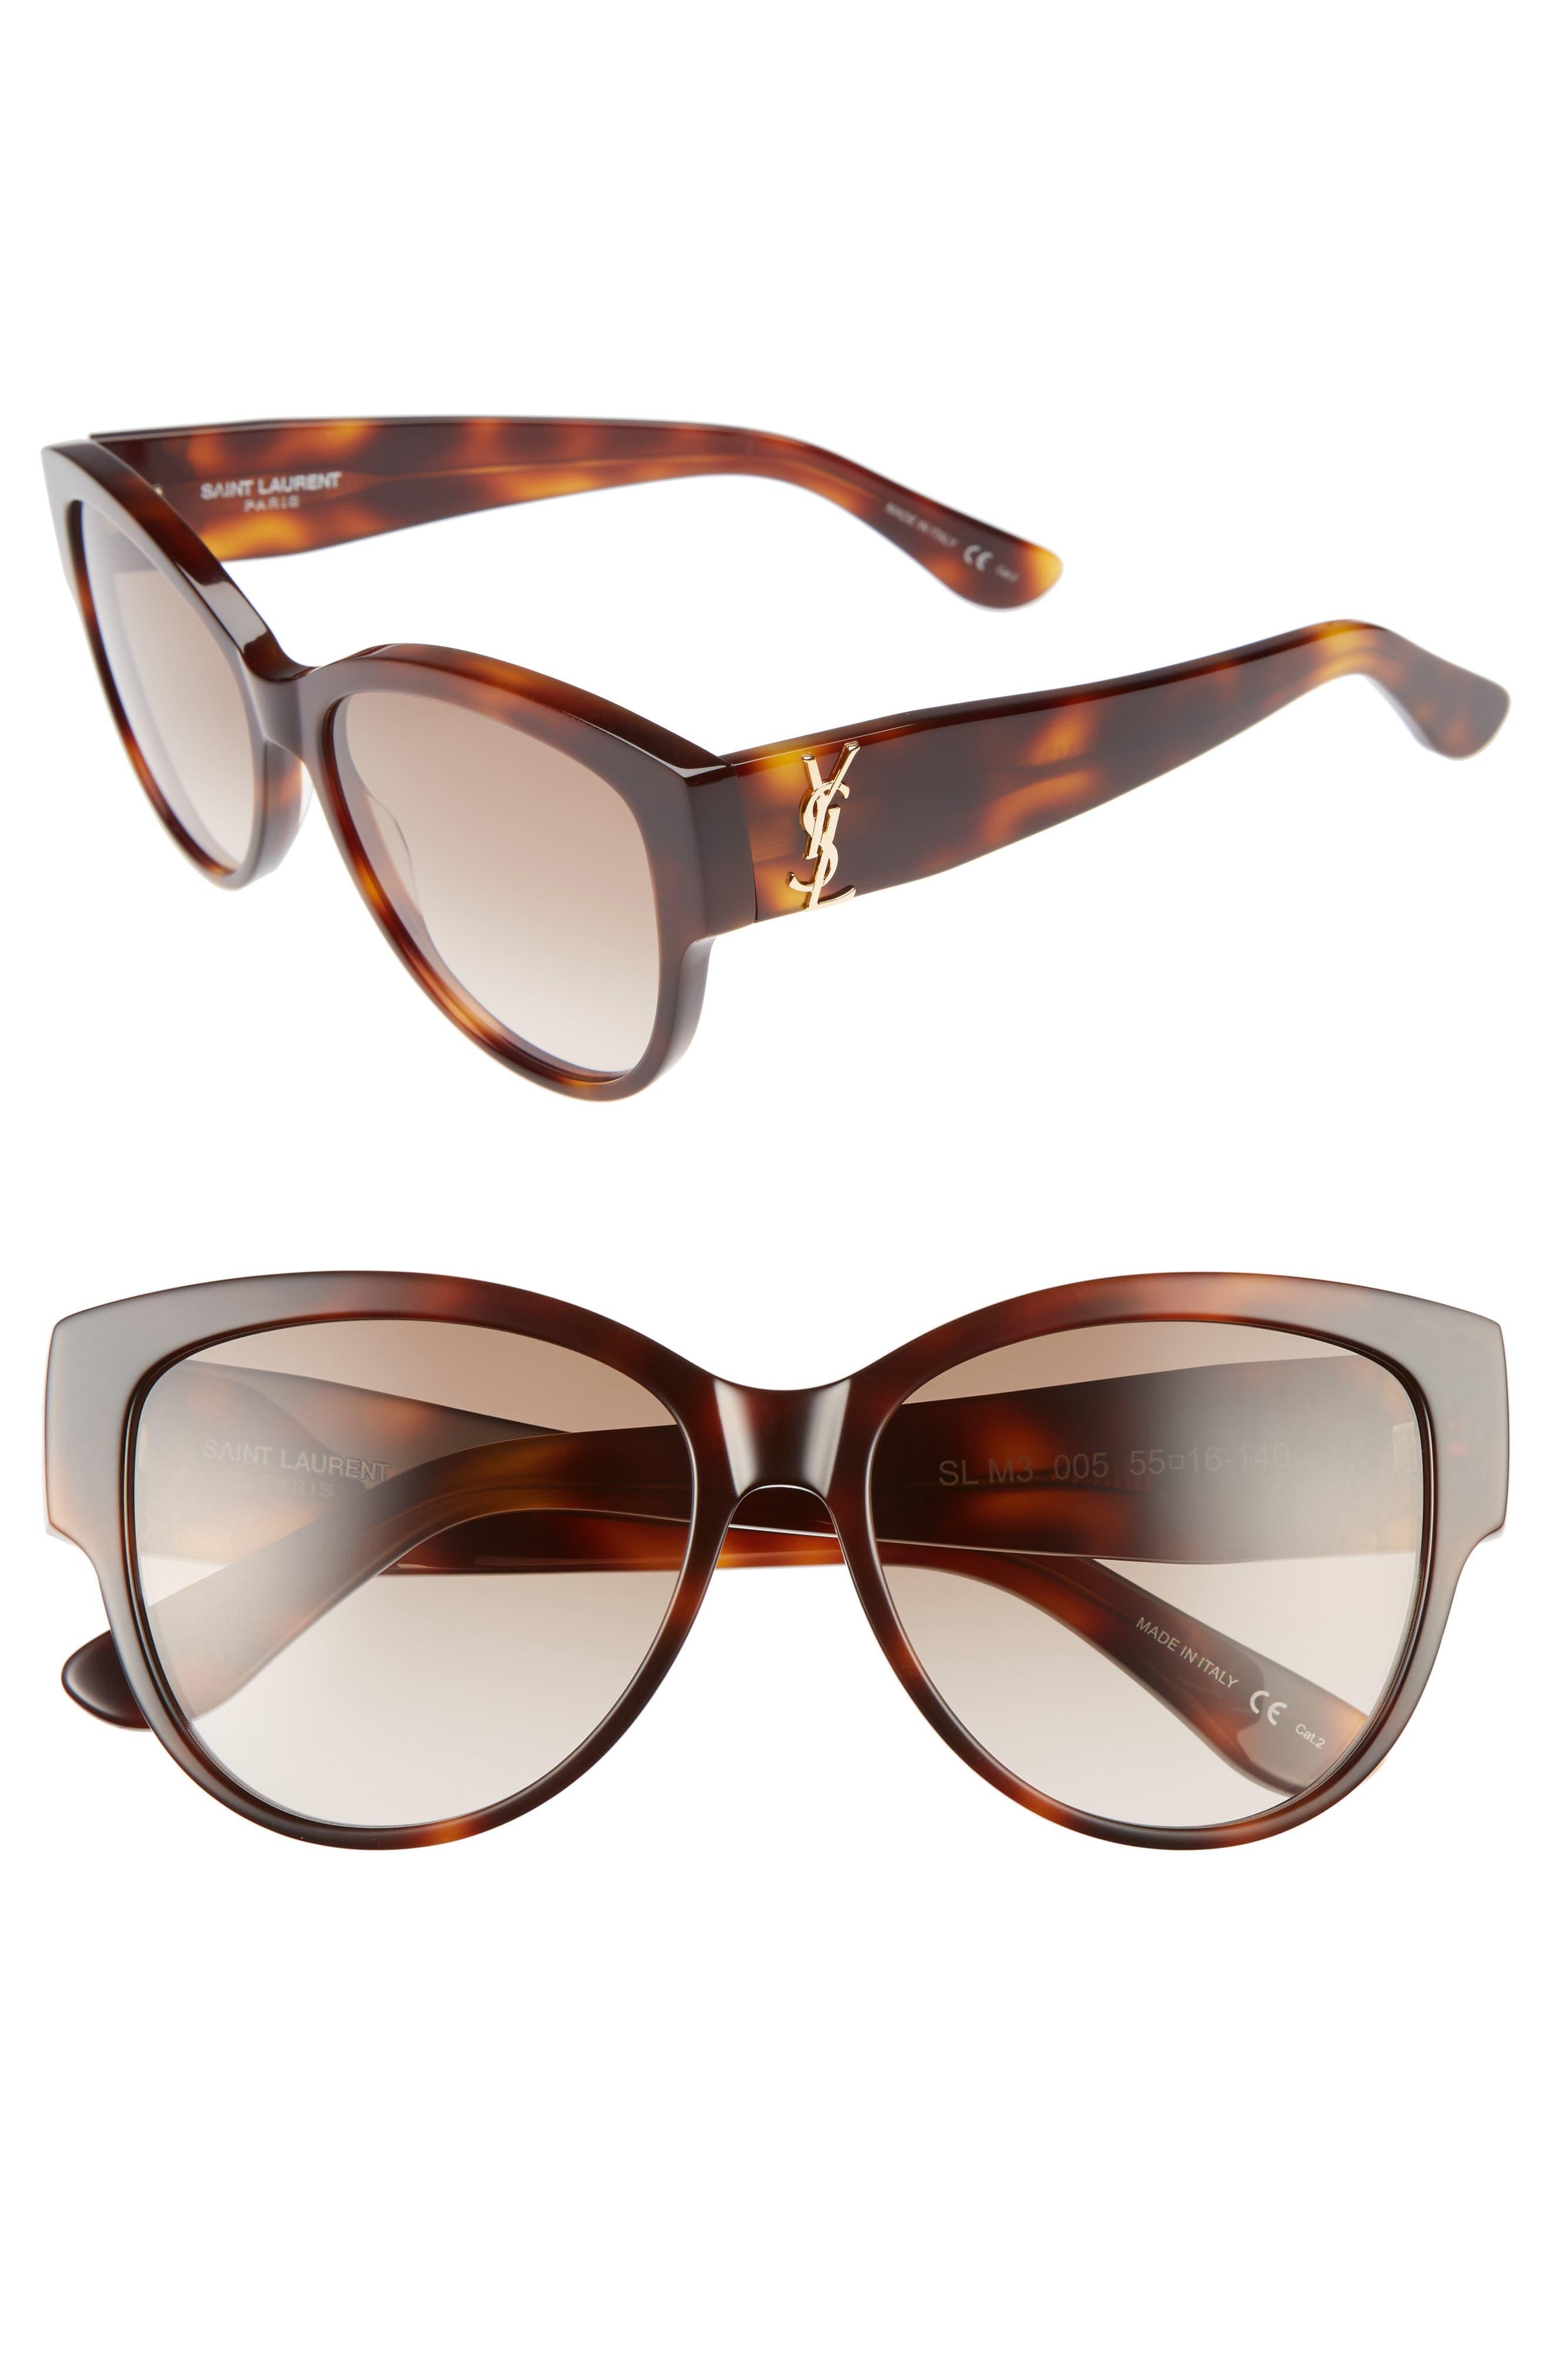 55mm Cat Eye Sunglasses,                             Main thumbnail 3, color,